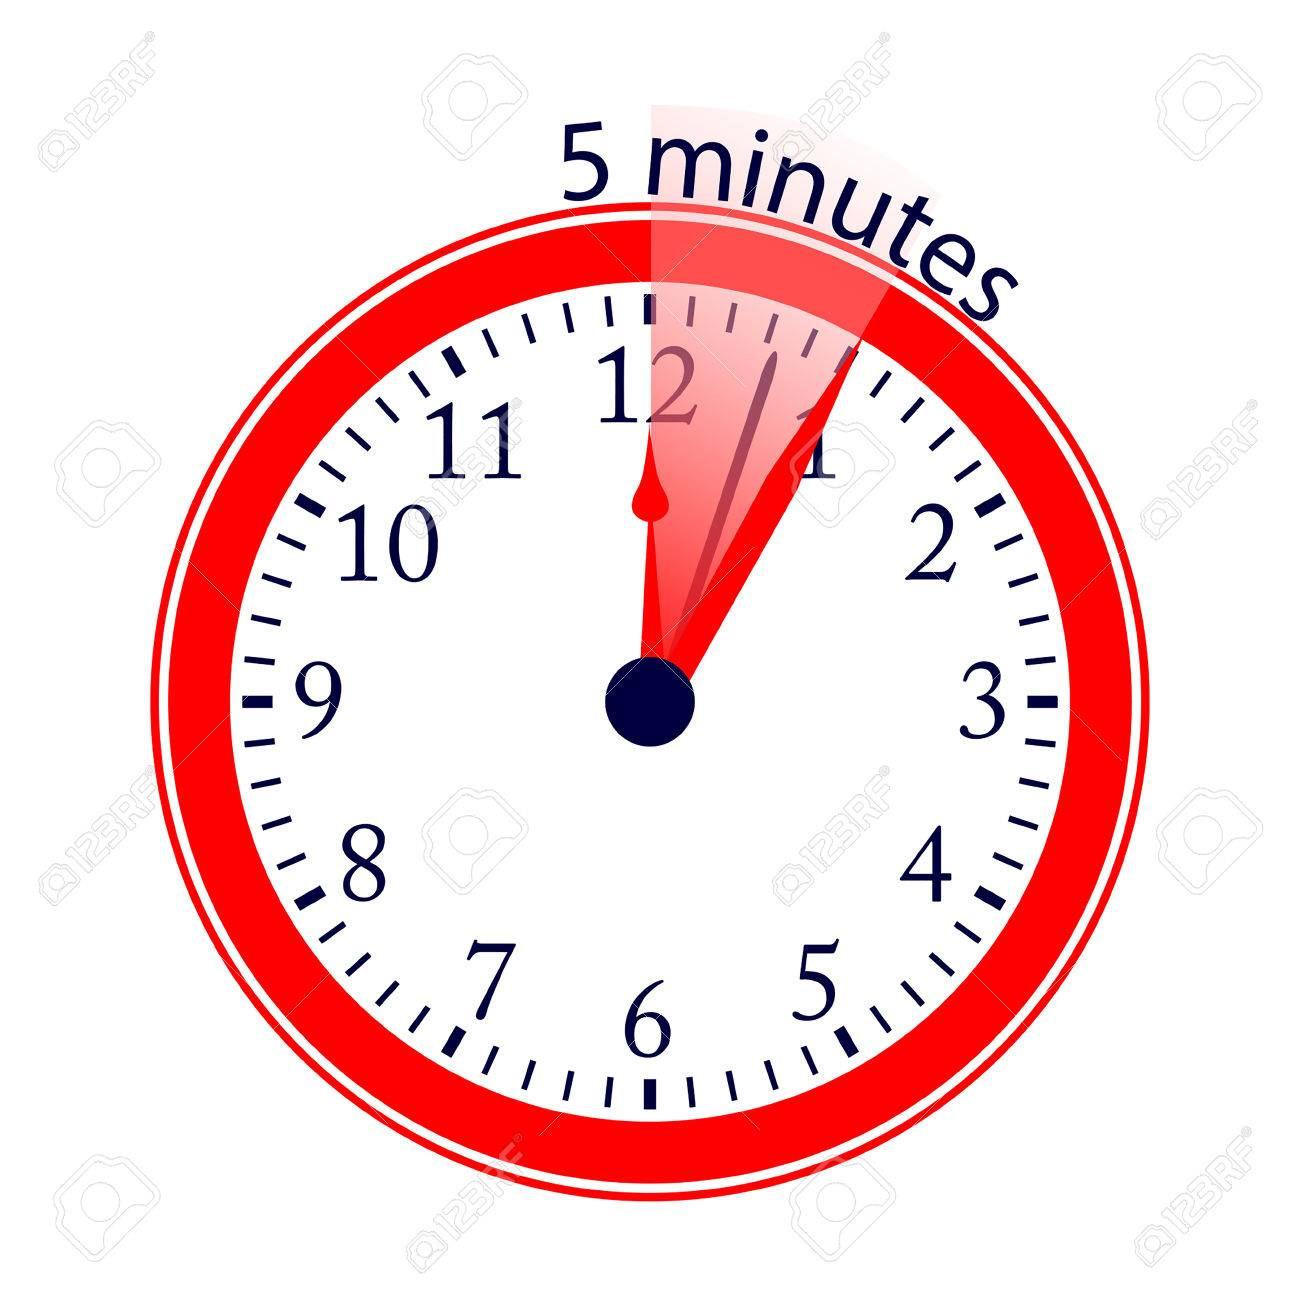 5 minutes clock - Isken kaptanband co